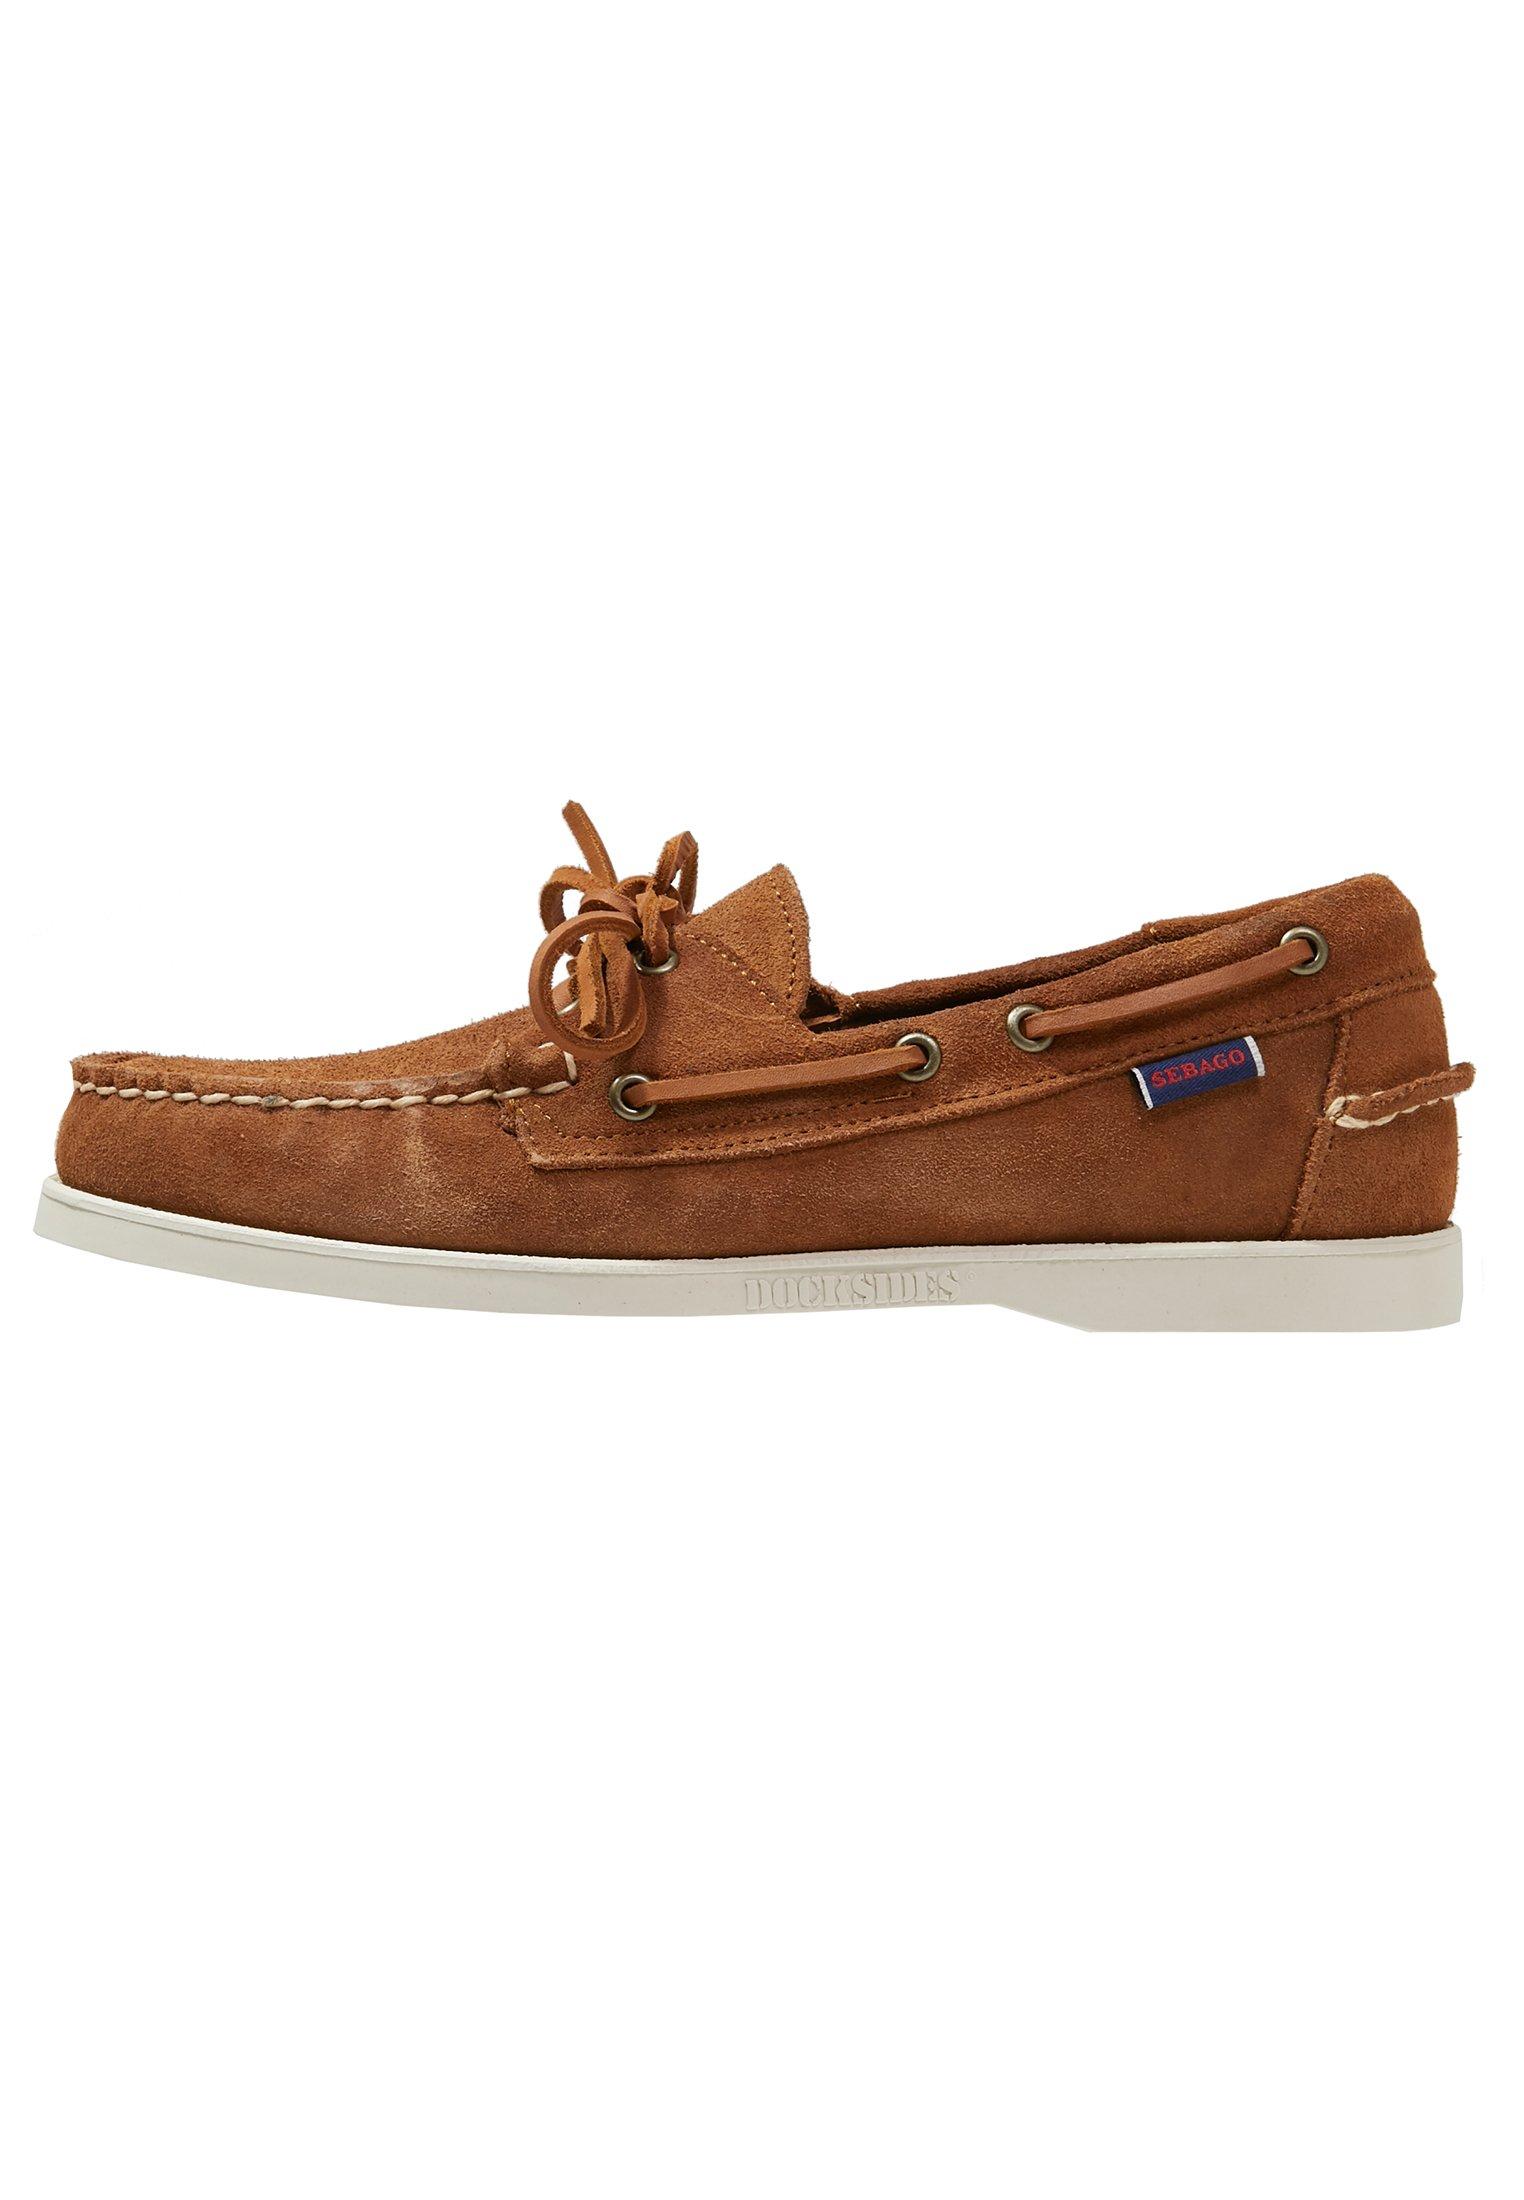 Homme DOCKSIDES PORTLAND - Chaussures bateau